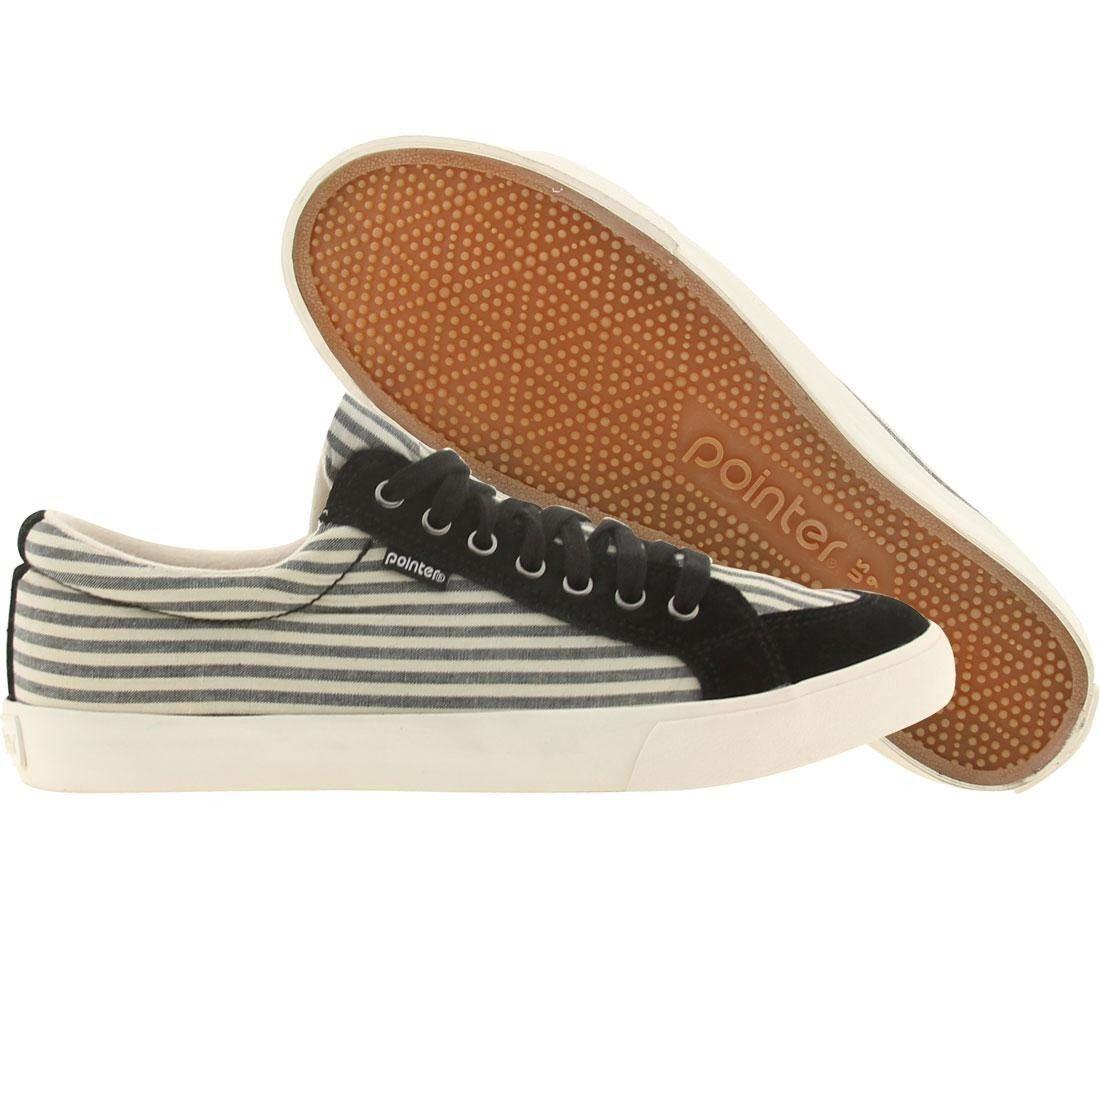 $139.99 Pointer Seeker IV (black / natural stripes) P08581H9K-821E